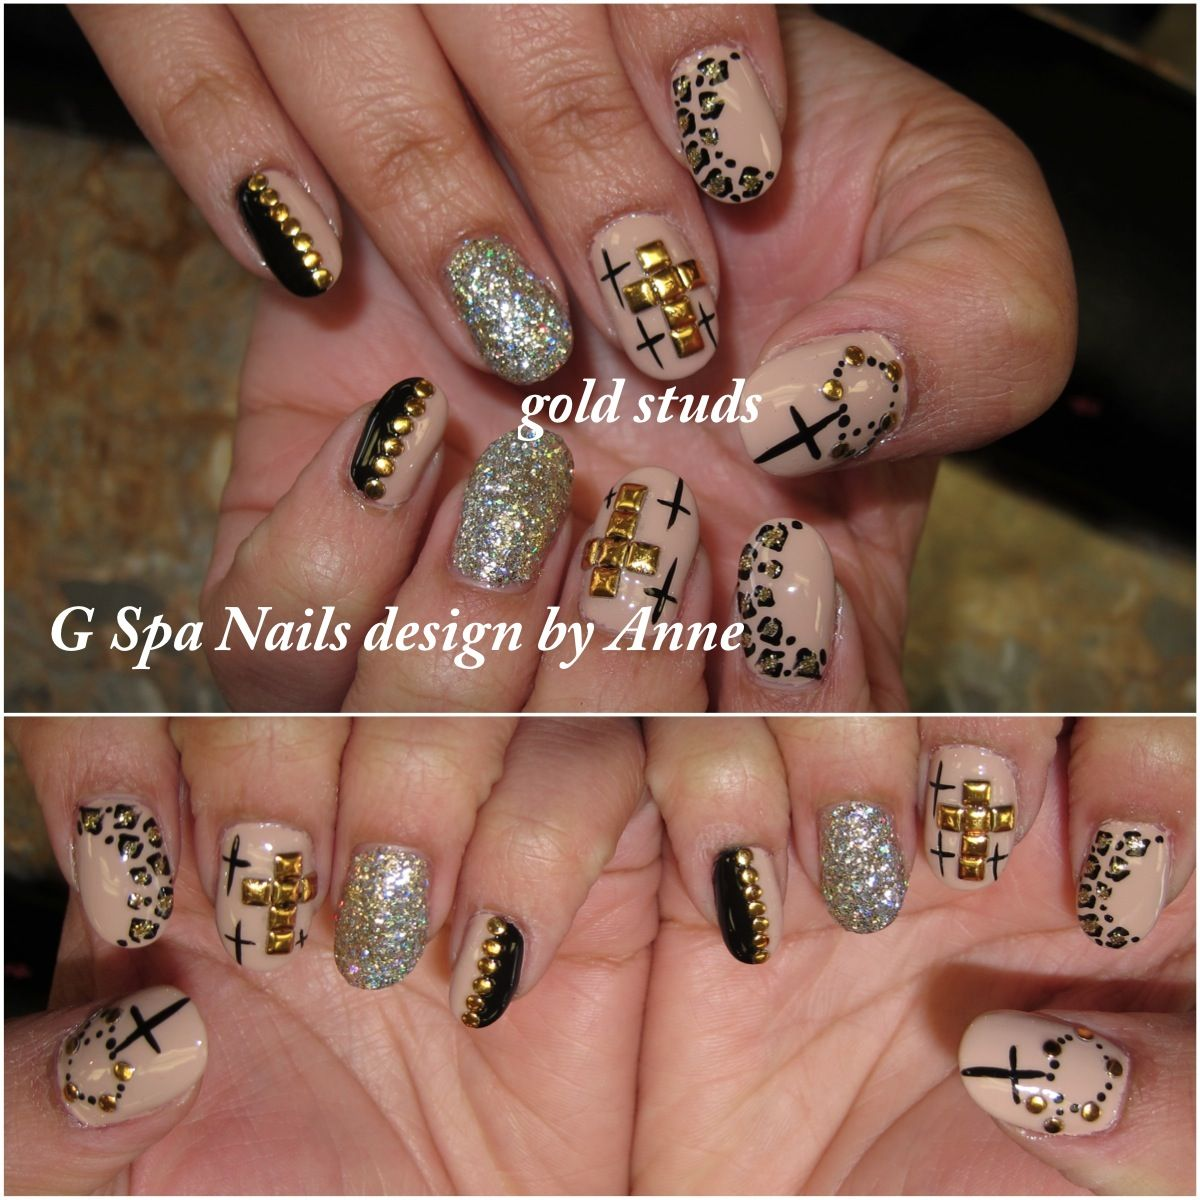 Gold Cross Nail Stud Designs Nails Designs Pinterest Cross